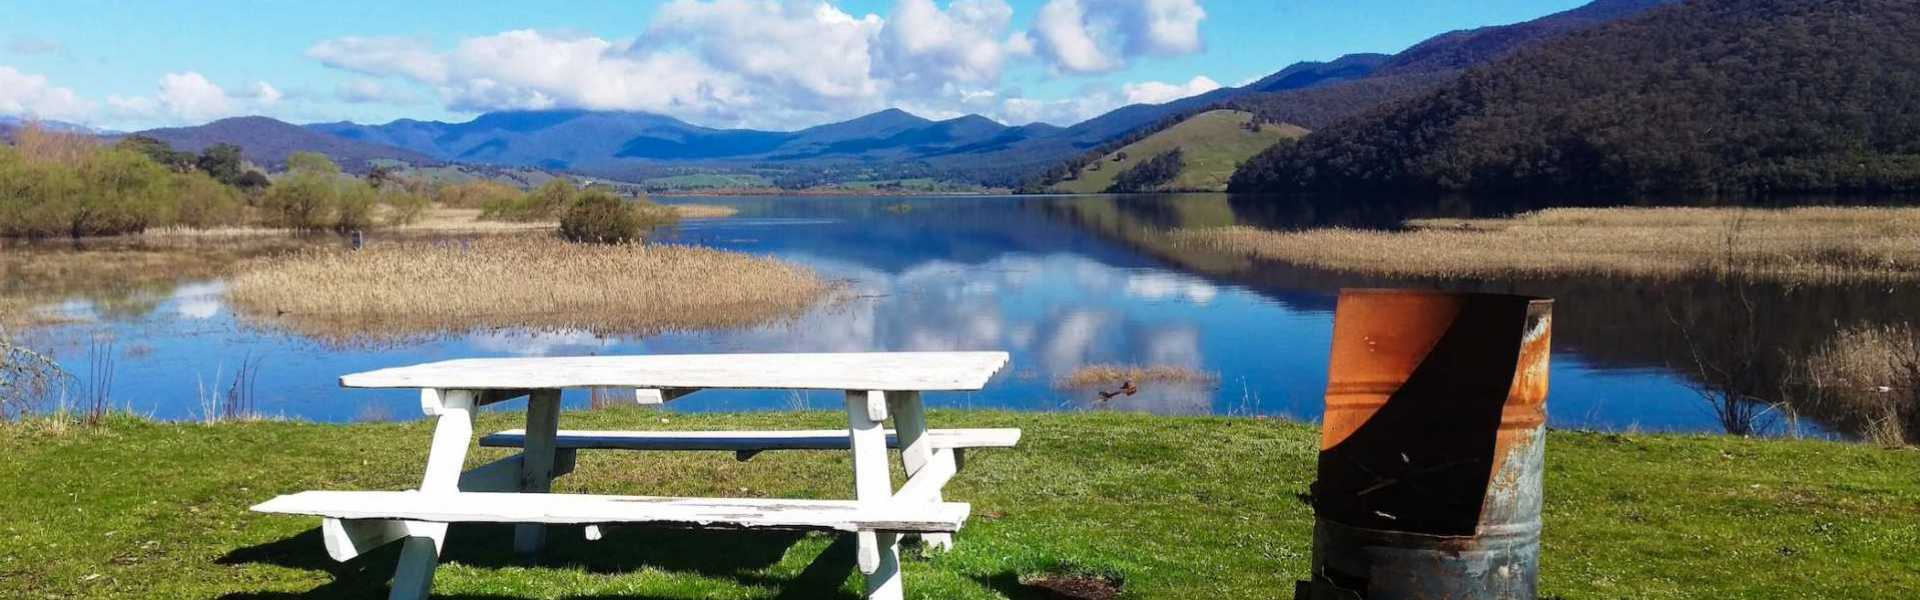 Kui Parks, Khancoban Lakeside Caravan Park, Lake